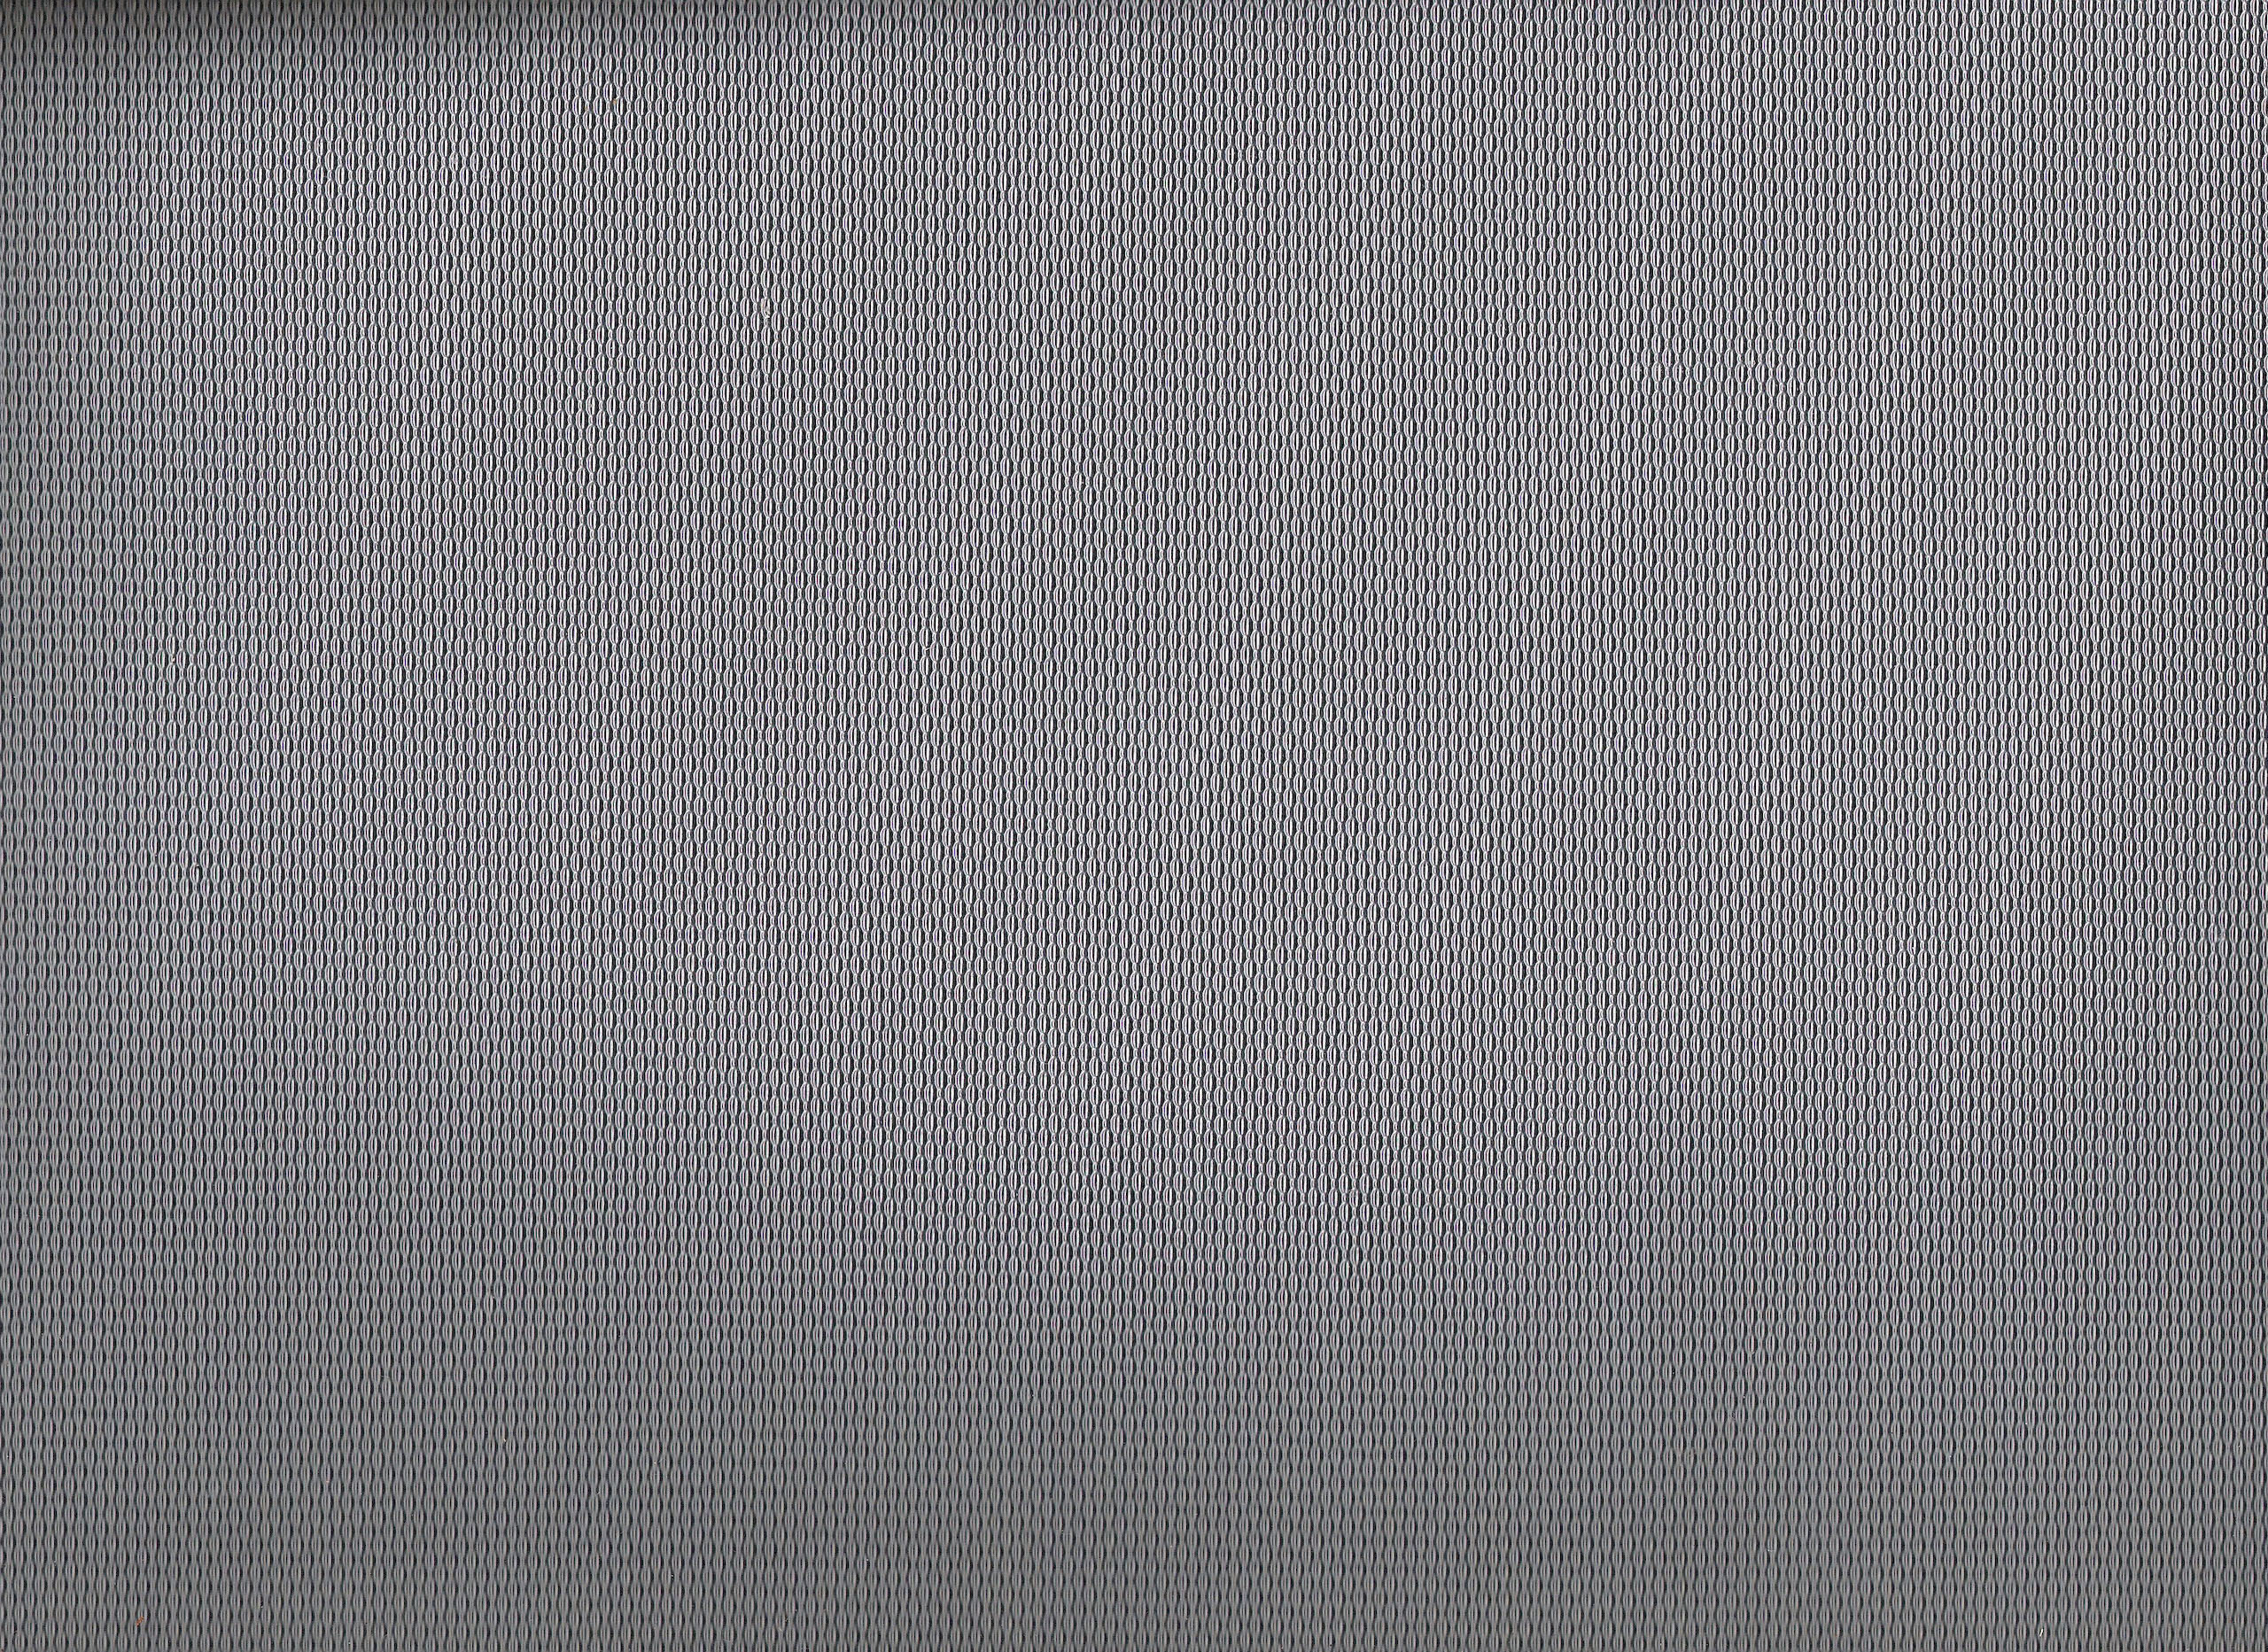 Fine Metal Mesh Fabric